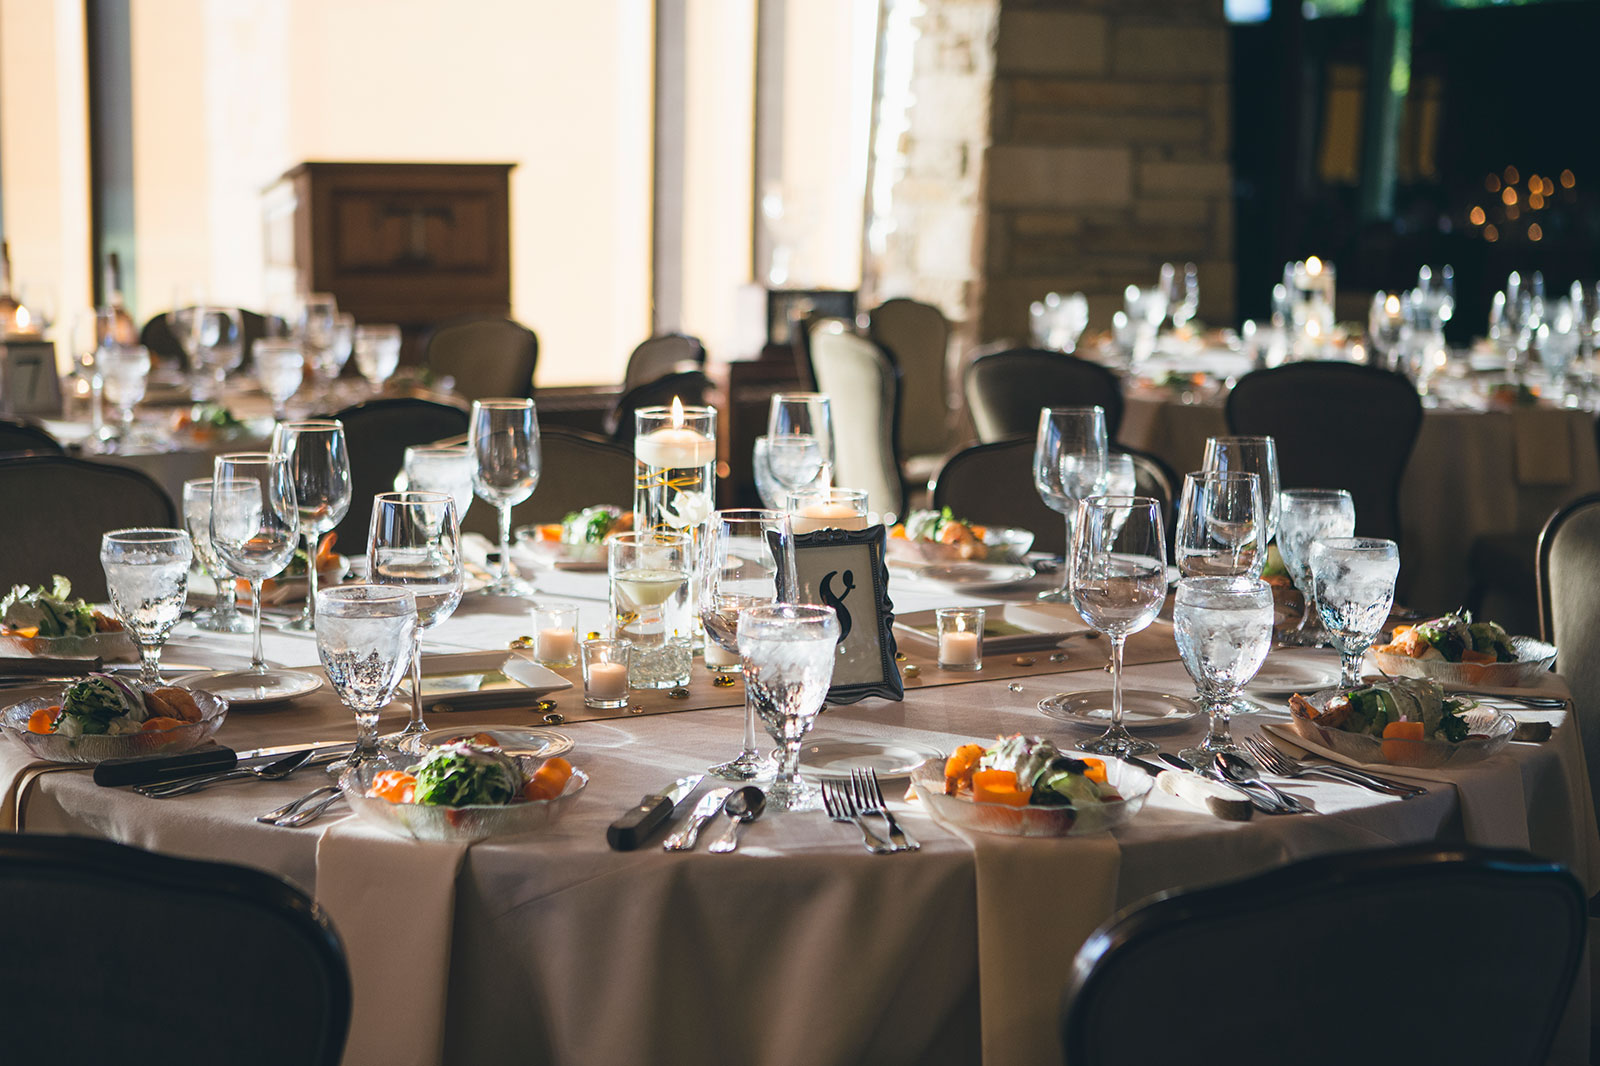 TCC-FW-Banner-1600x1066-Weddings.jpg